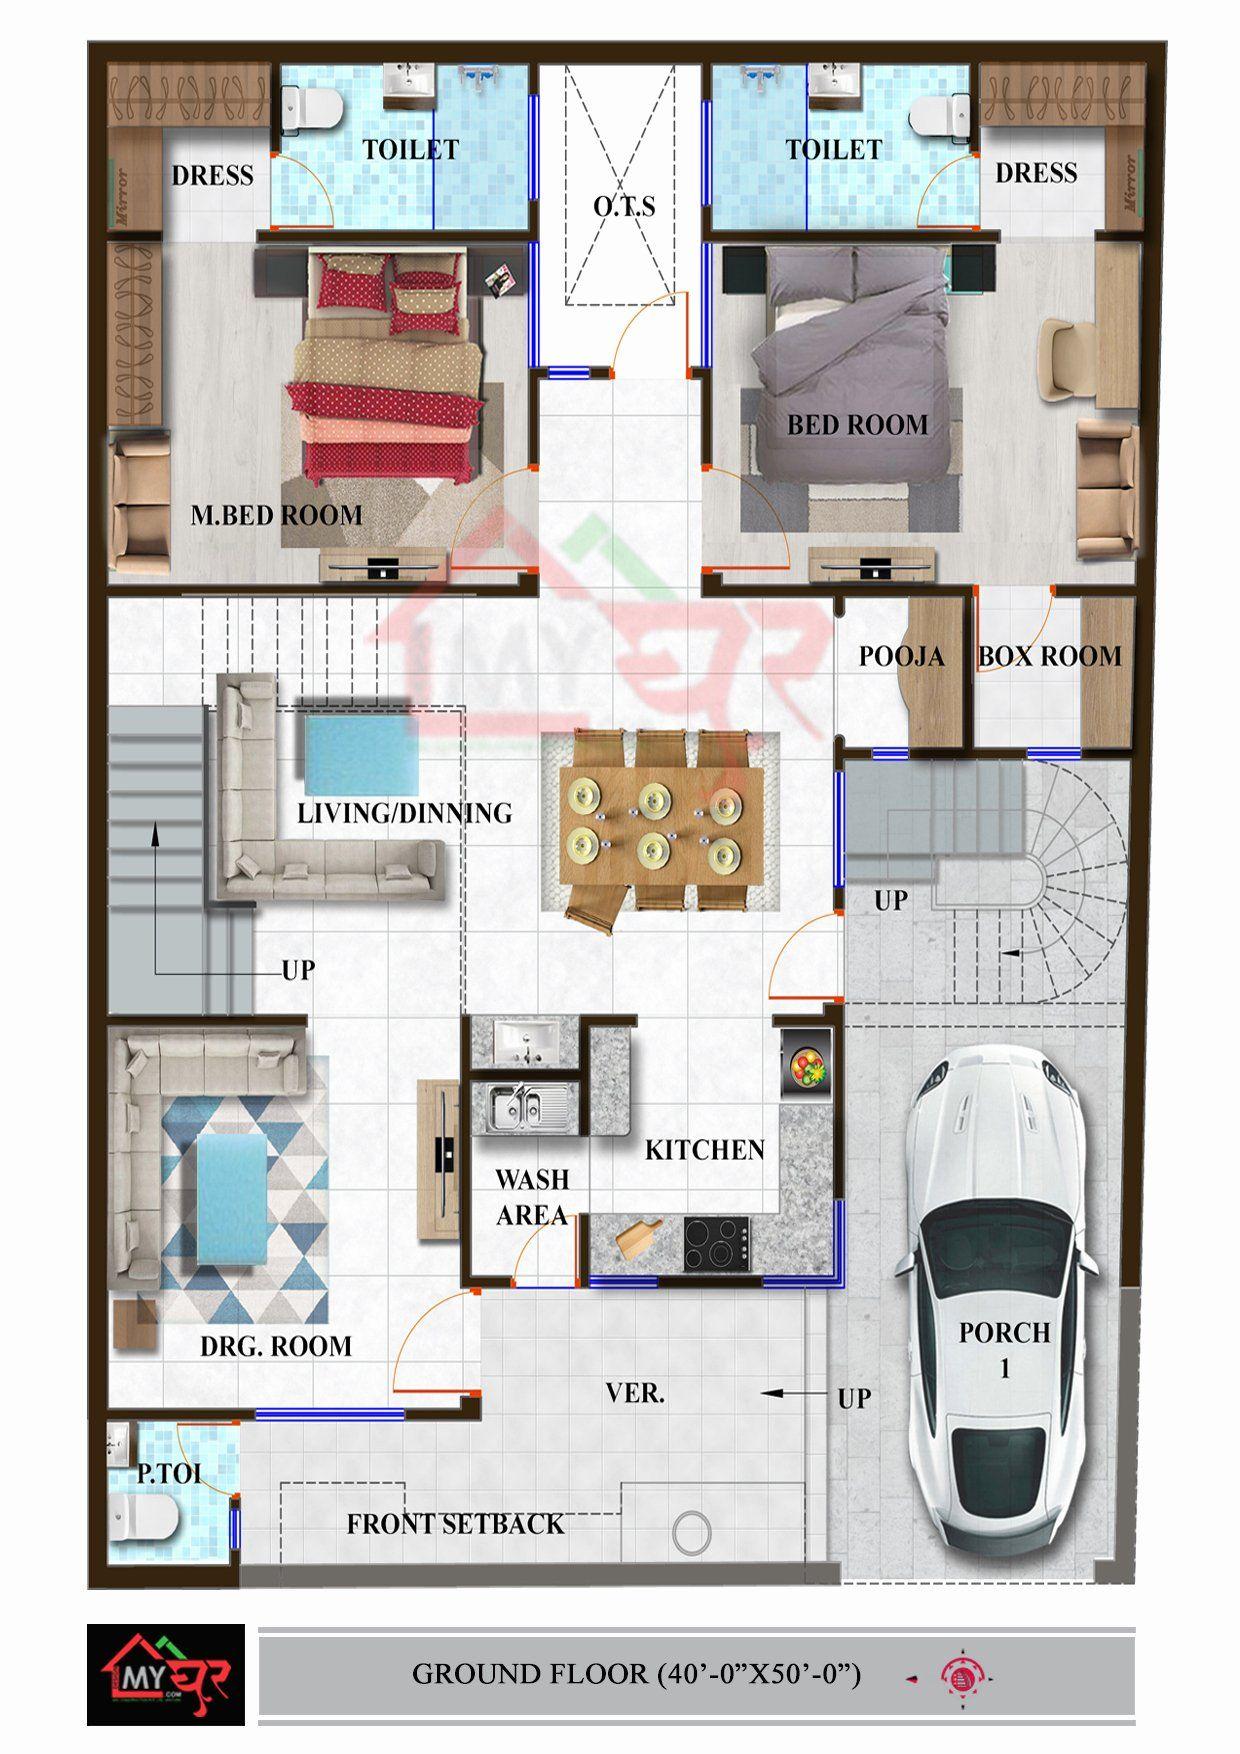 40 X 50 House Plans Best Of Floor Plan For 40 X 50 Feet Plot Kayleighdickinson Best In 2021 Indian House Plans My House Plans Cottage Style House Plans